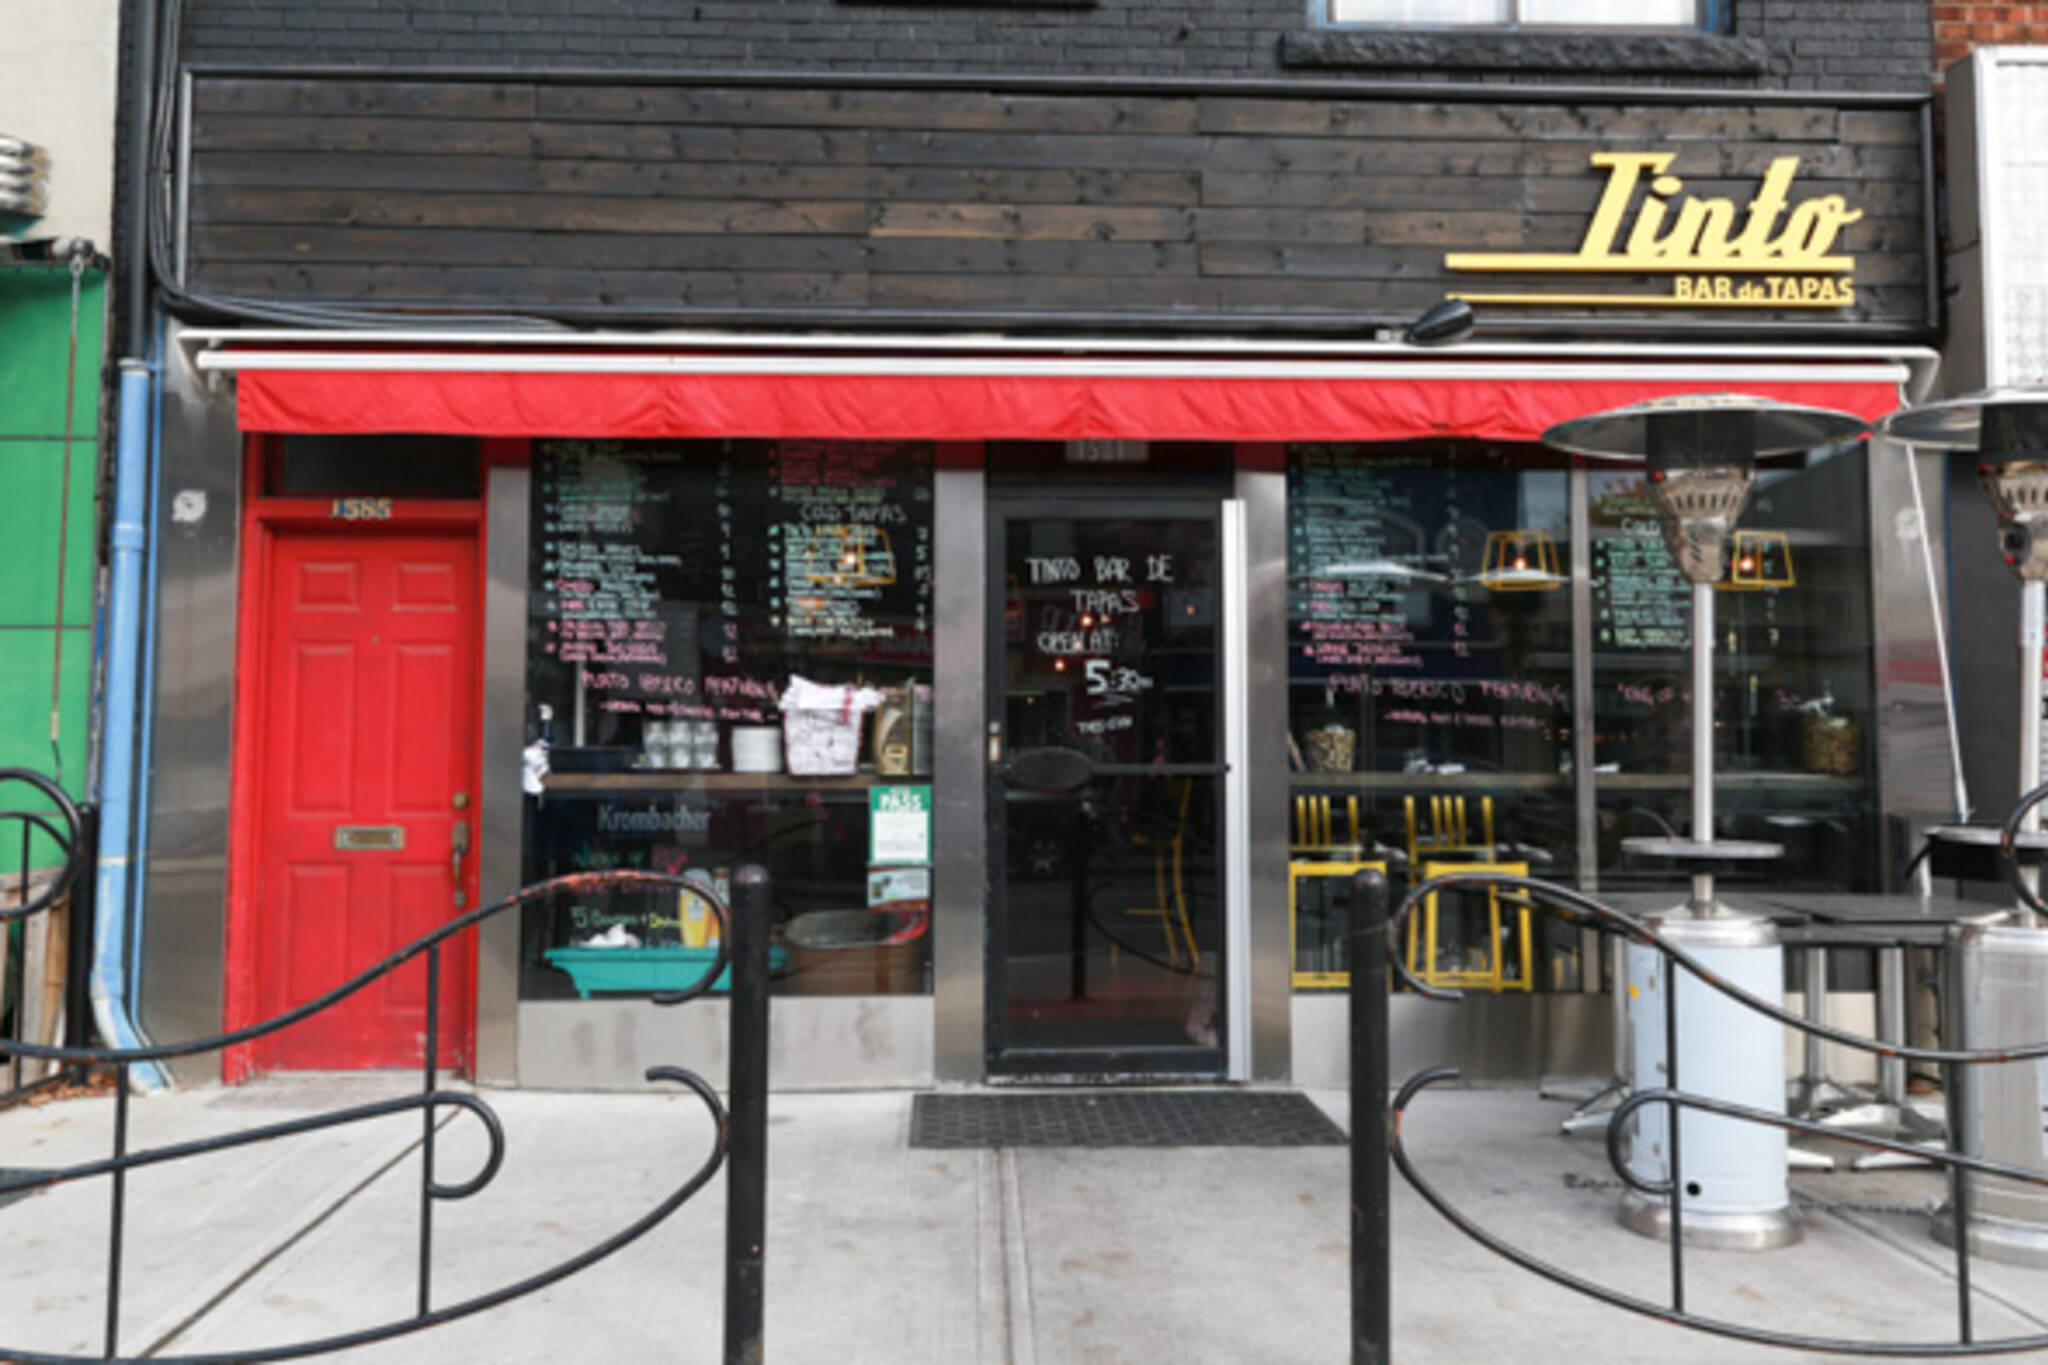 tinto bar and tapas